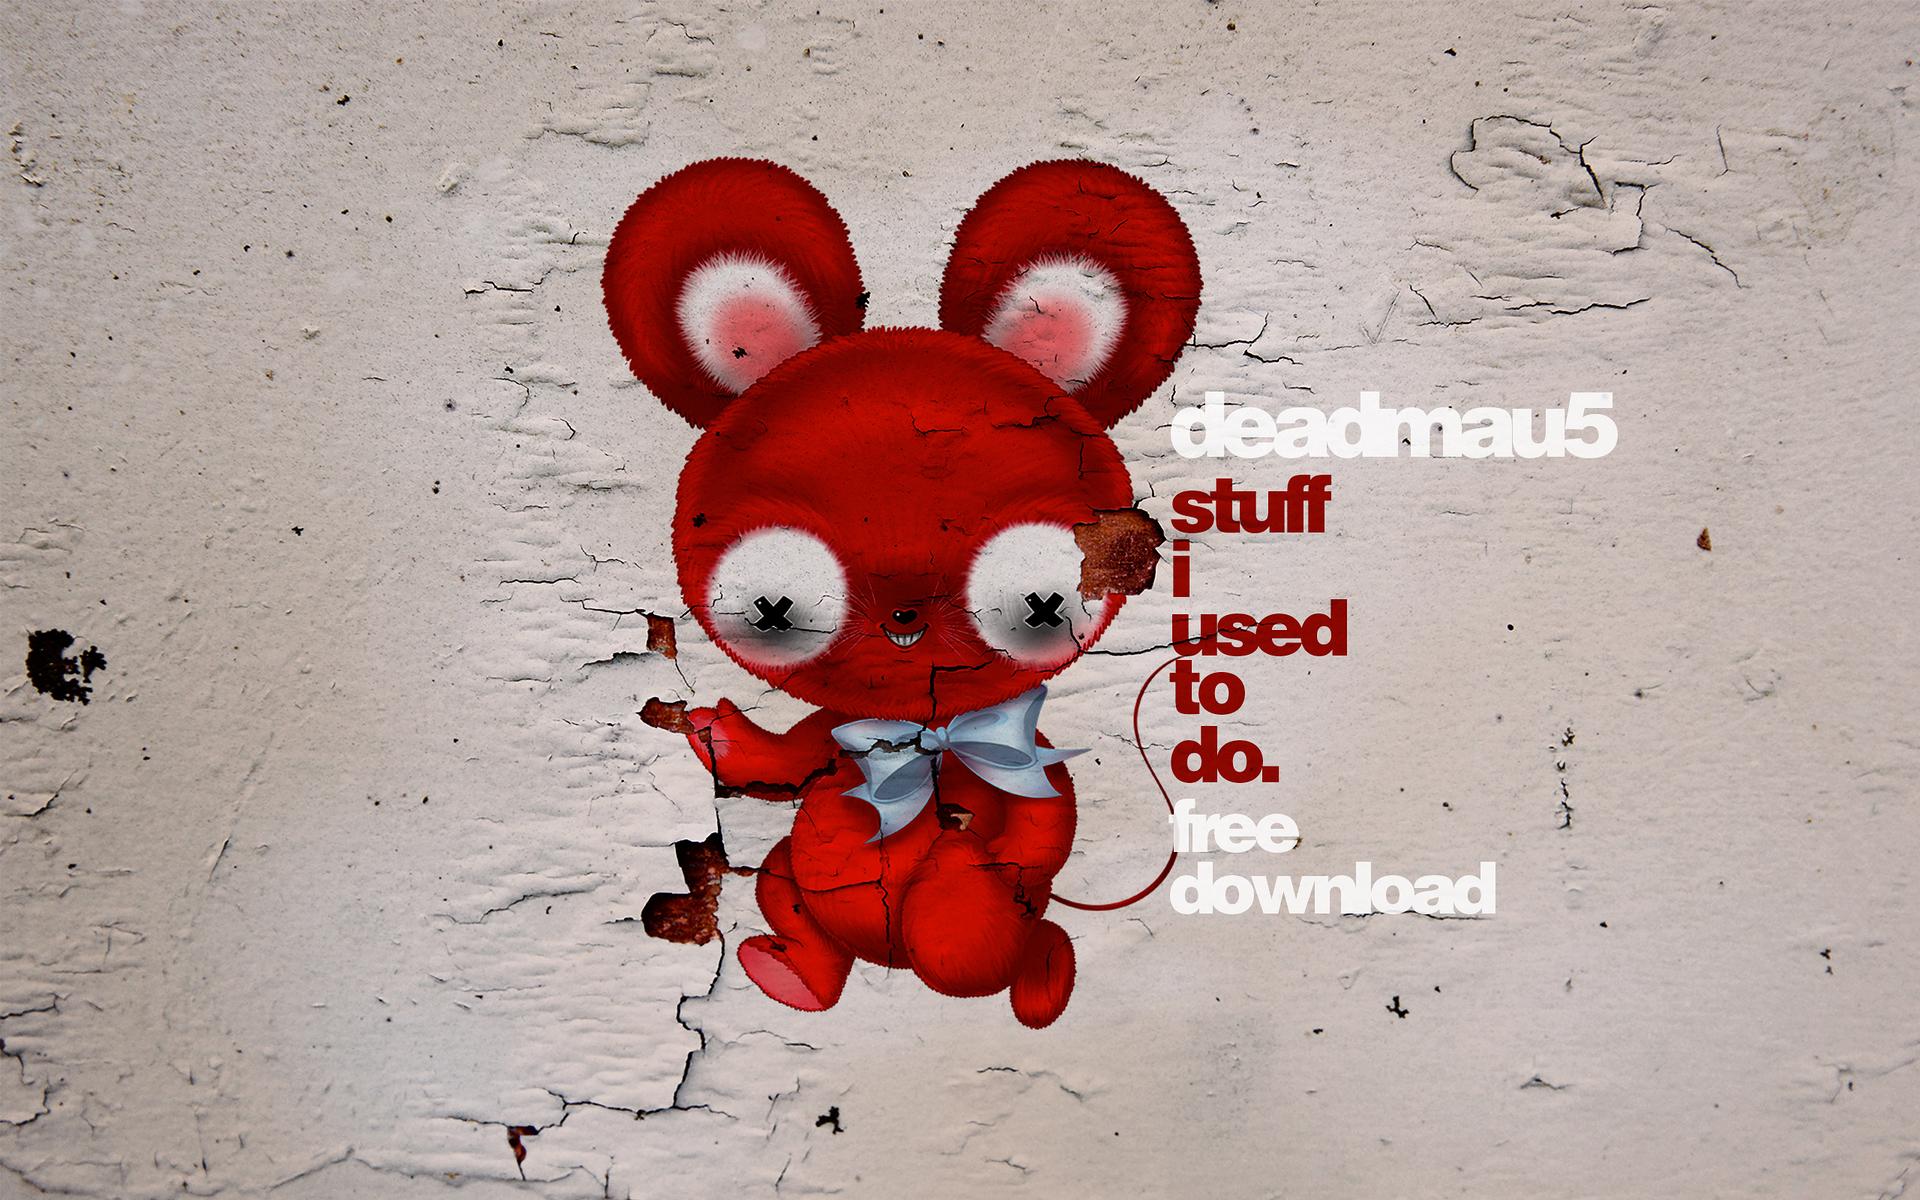 deadmau5-stuff-i-used-to-do.jpg